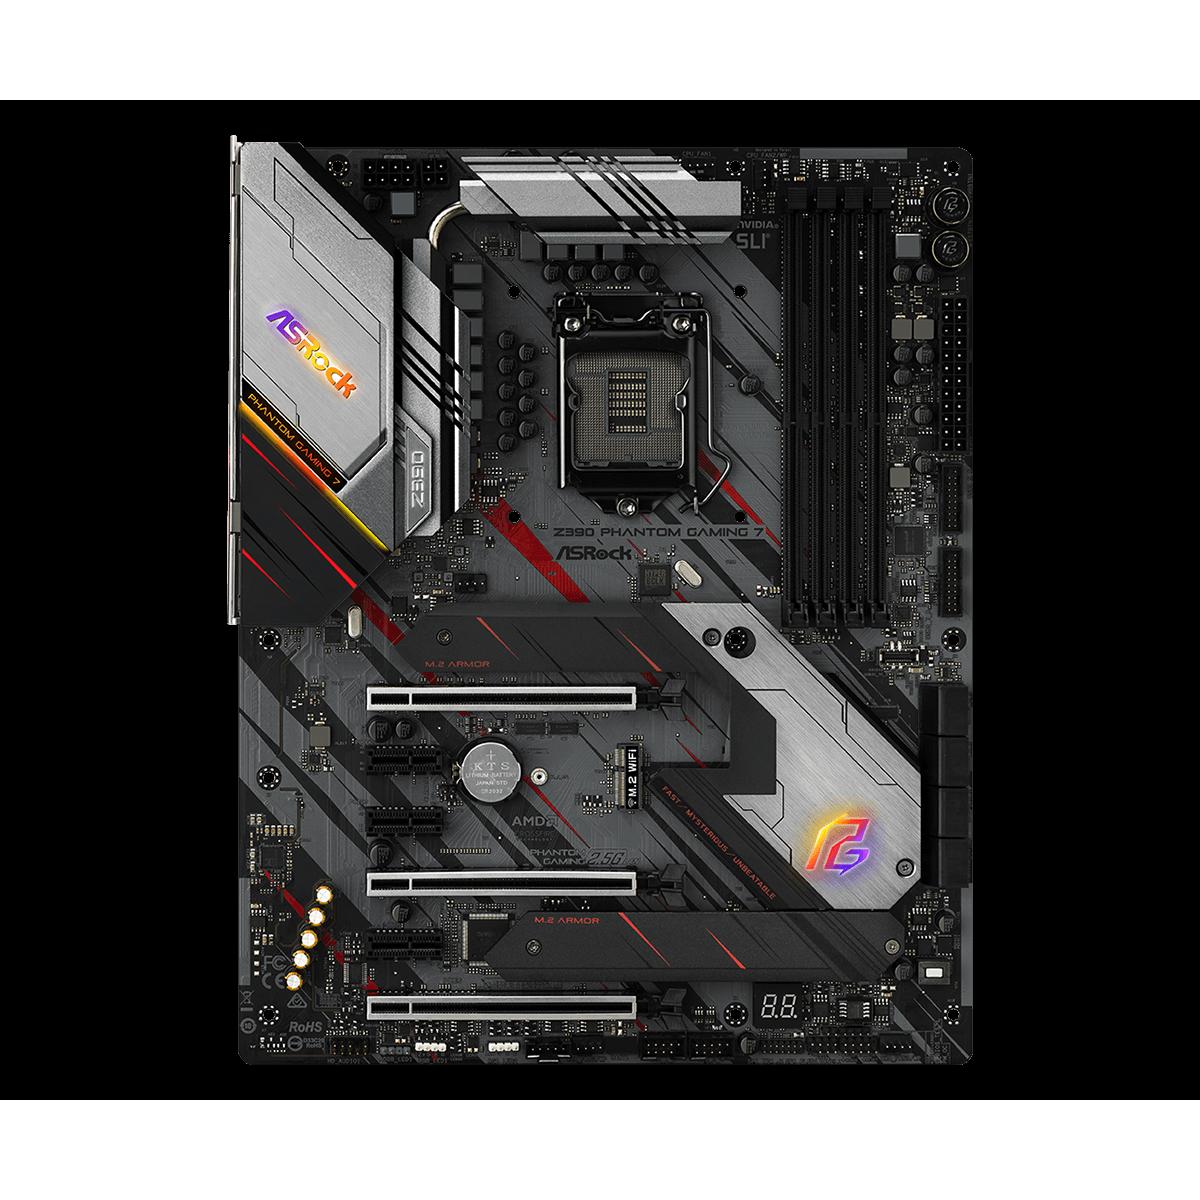 Placa Mãe Asrock Z390 Phantom Gaming 7, Chipset Z390, Intel LGA 1151, ATX, DDR4